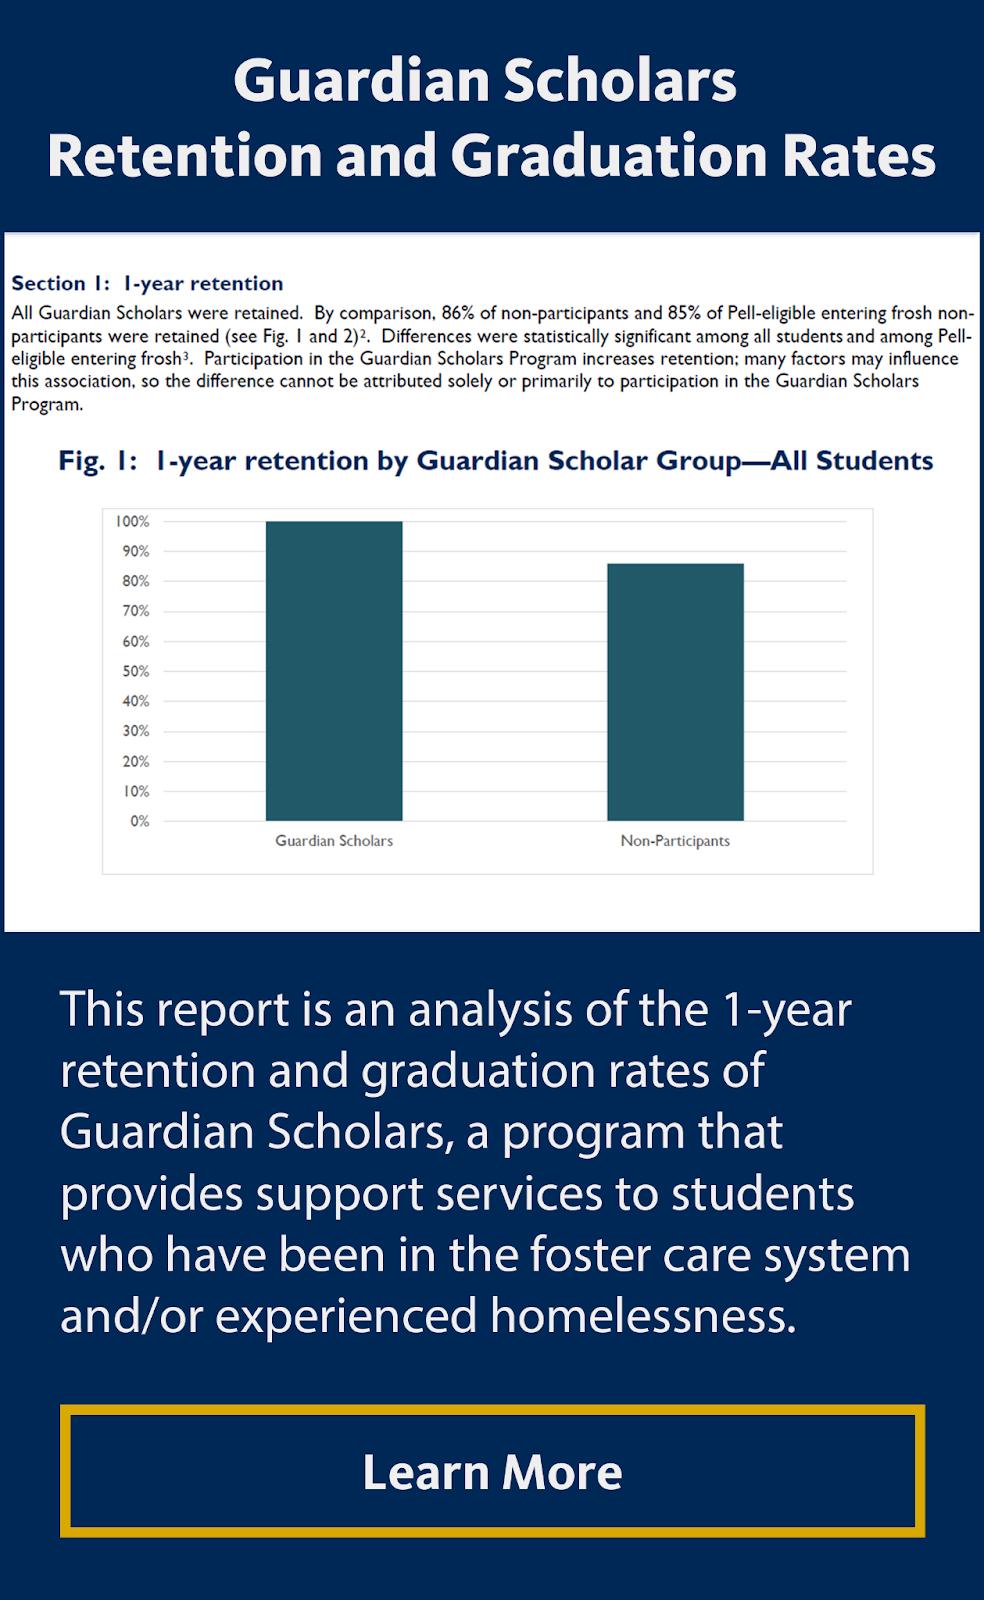 Guardian Scholars Retention and Graduation Rates